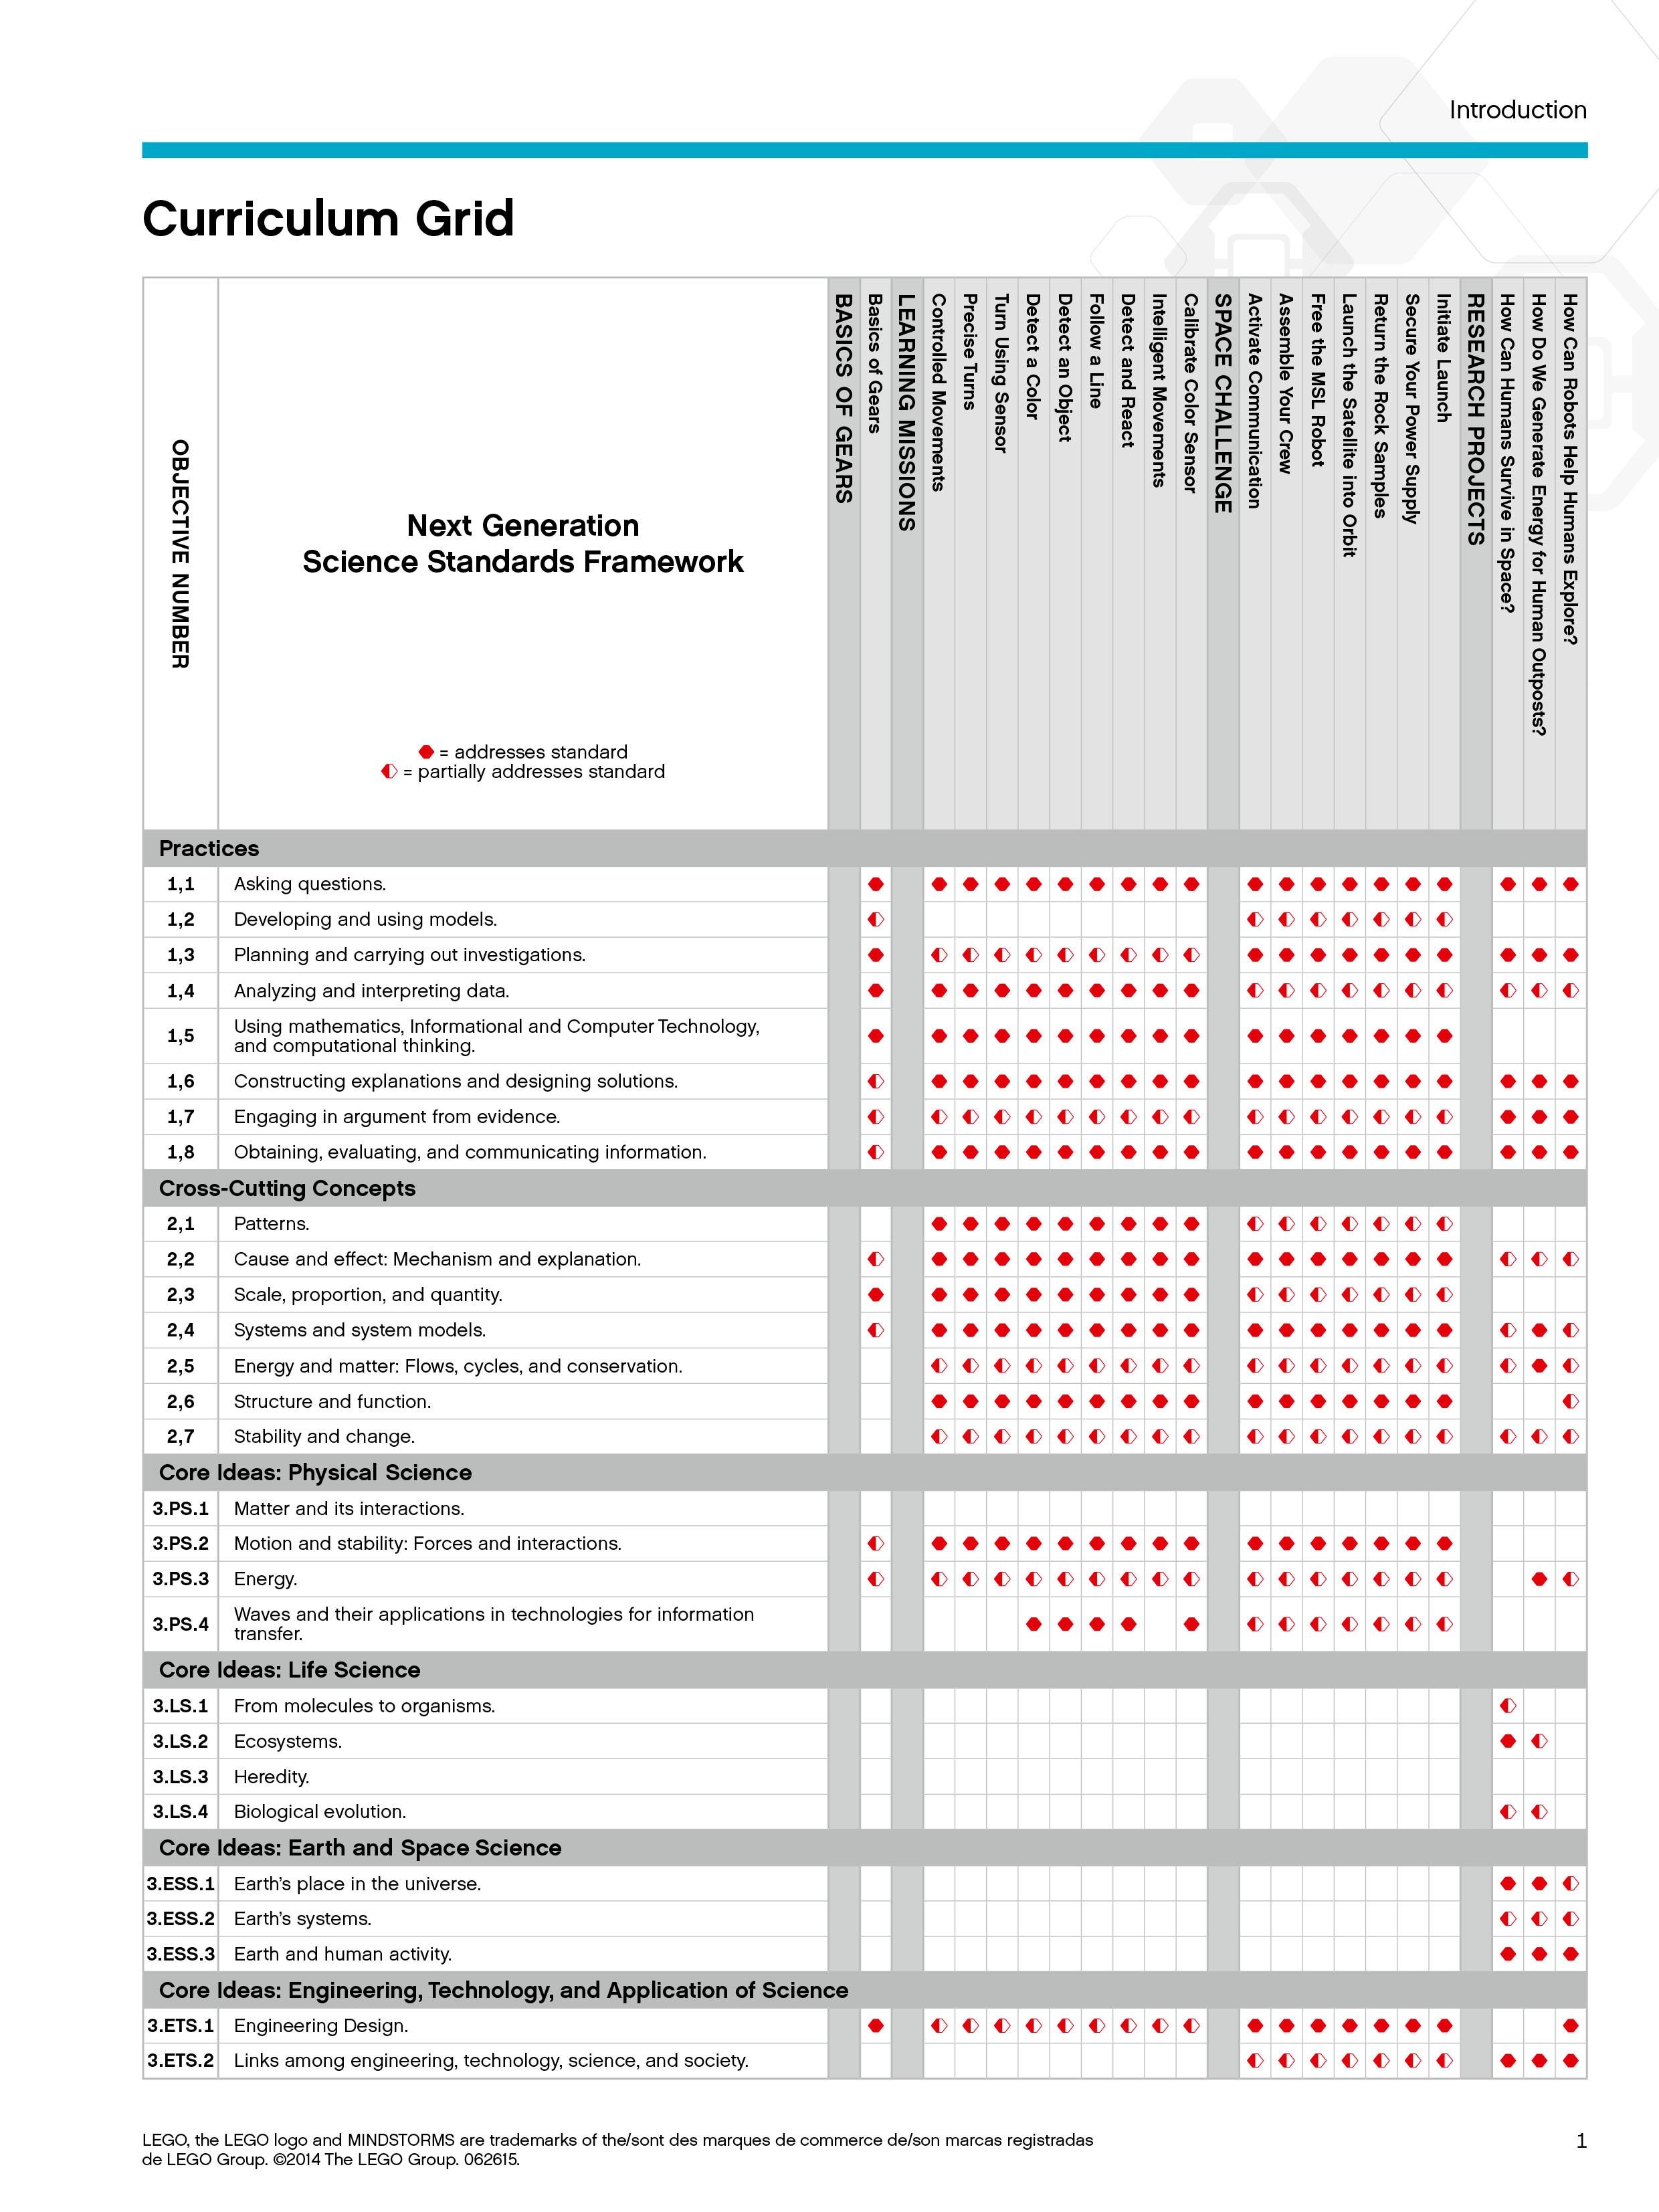 MINDSTORMS EV3 Space Challenge curriculum grid